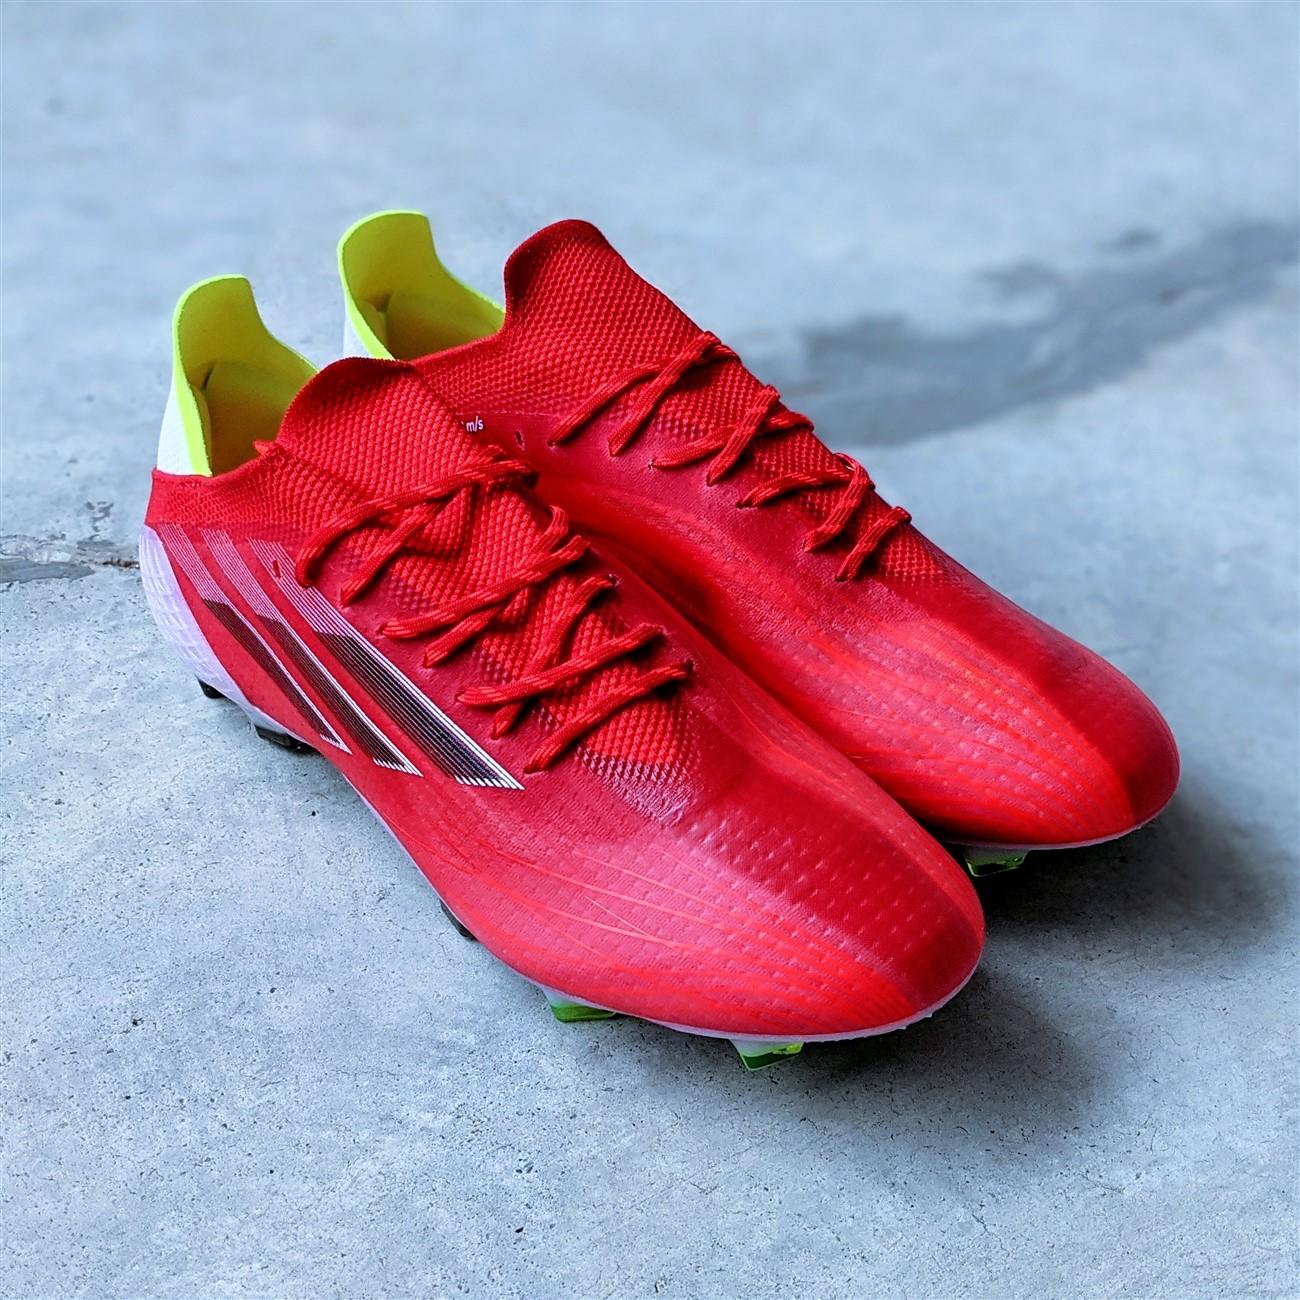 adidas x speedflow football boots soccer cleats